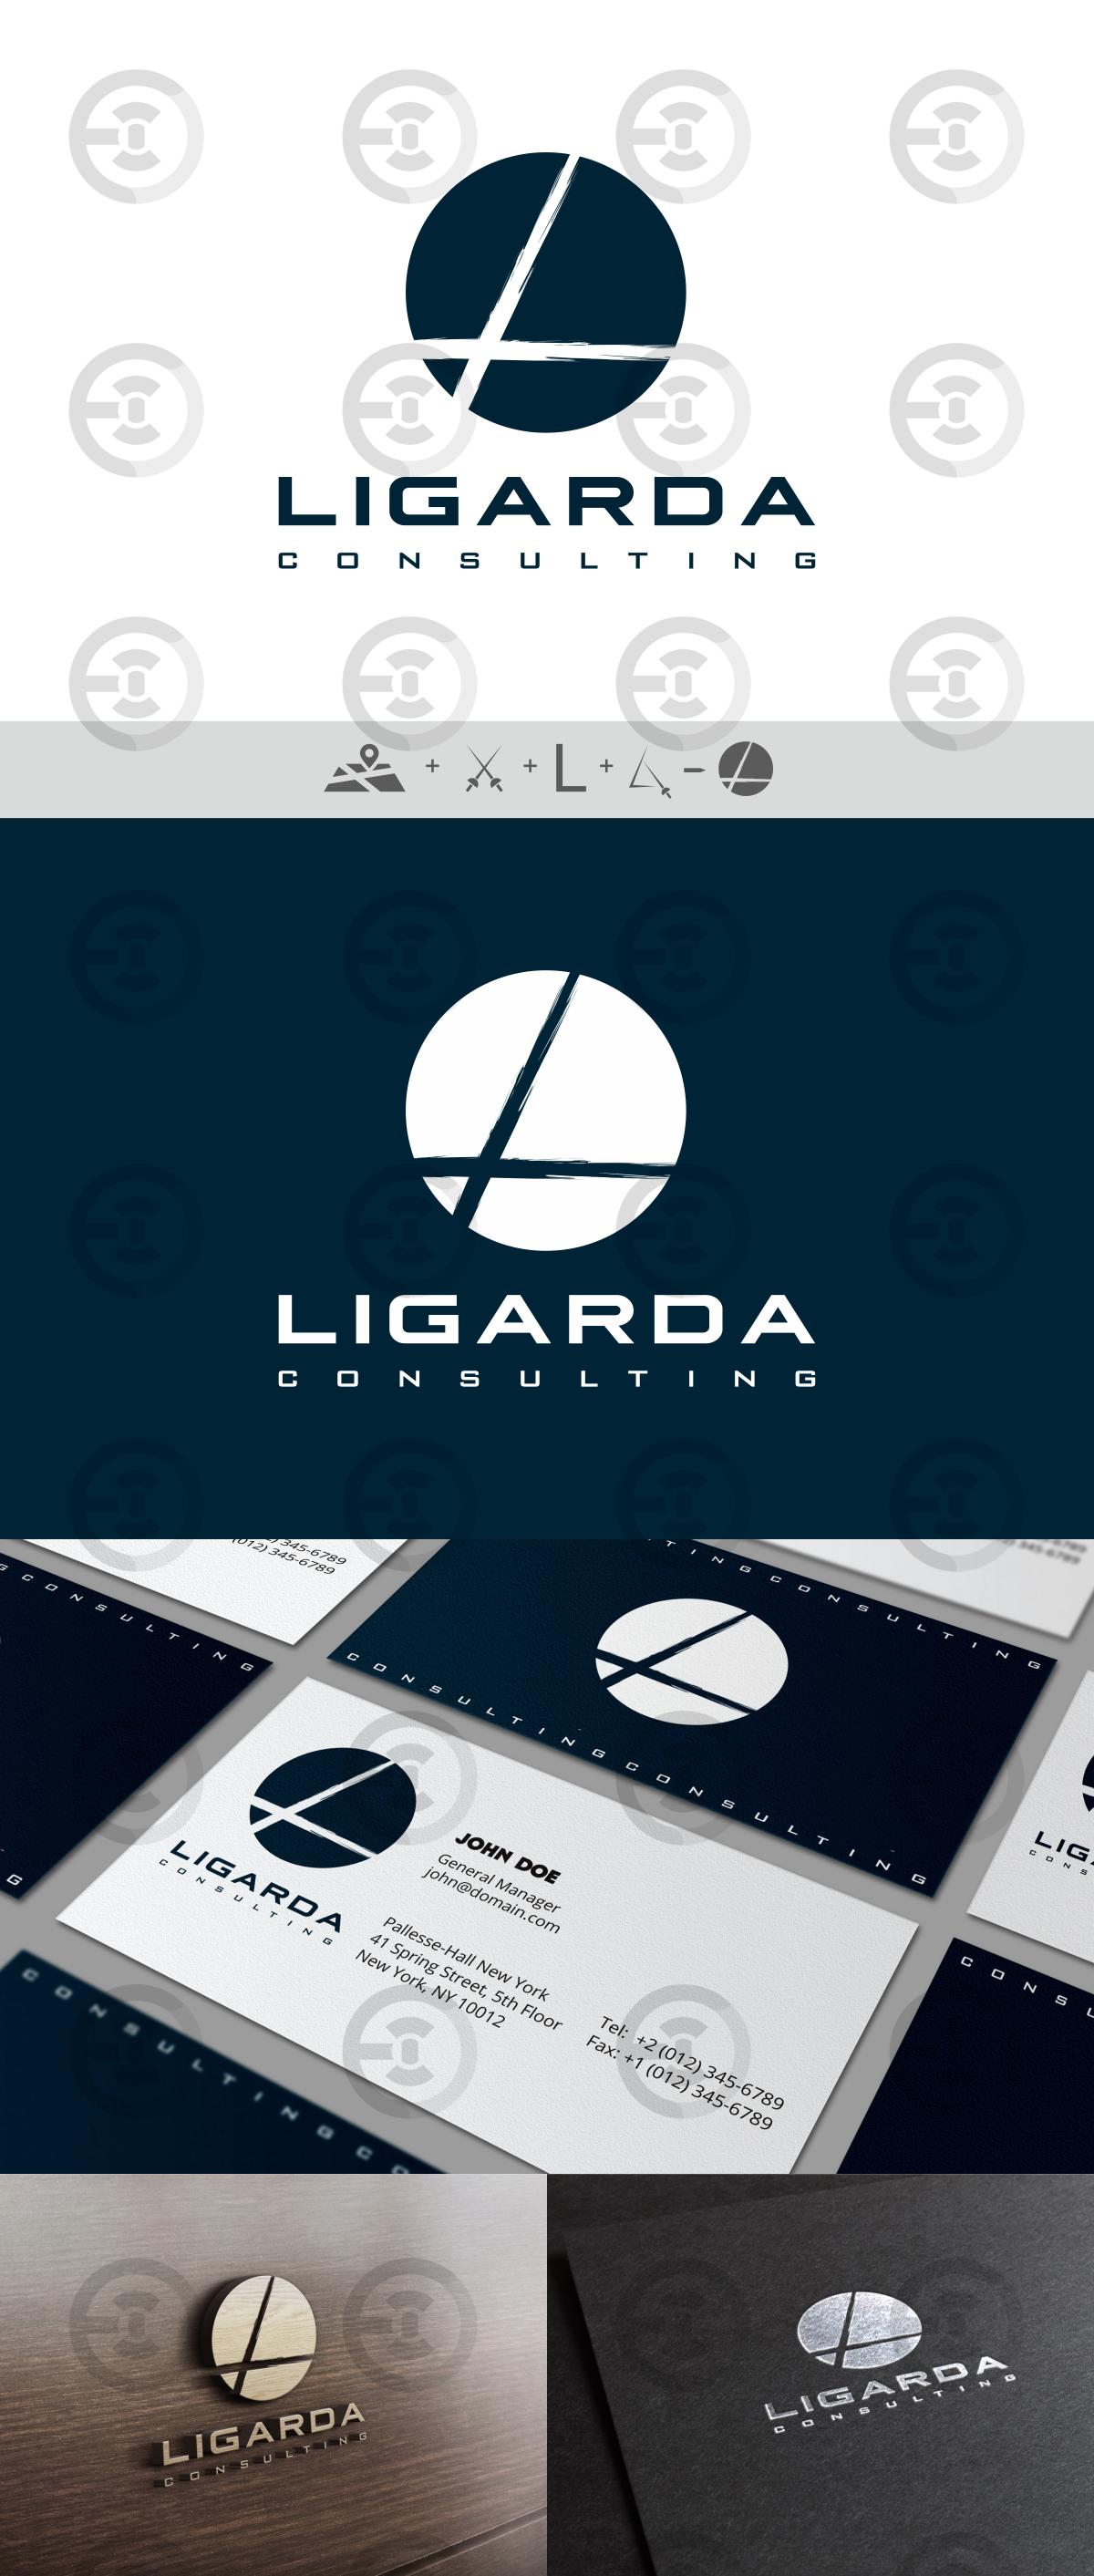 Ligarda_1.jpg